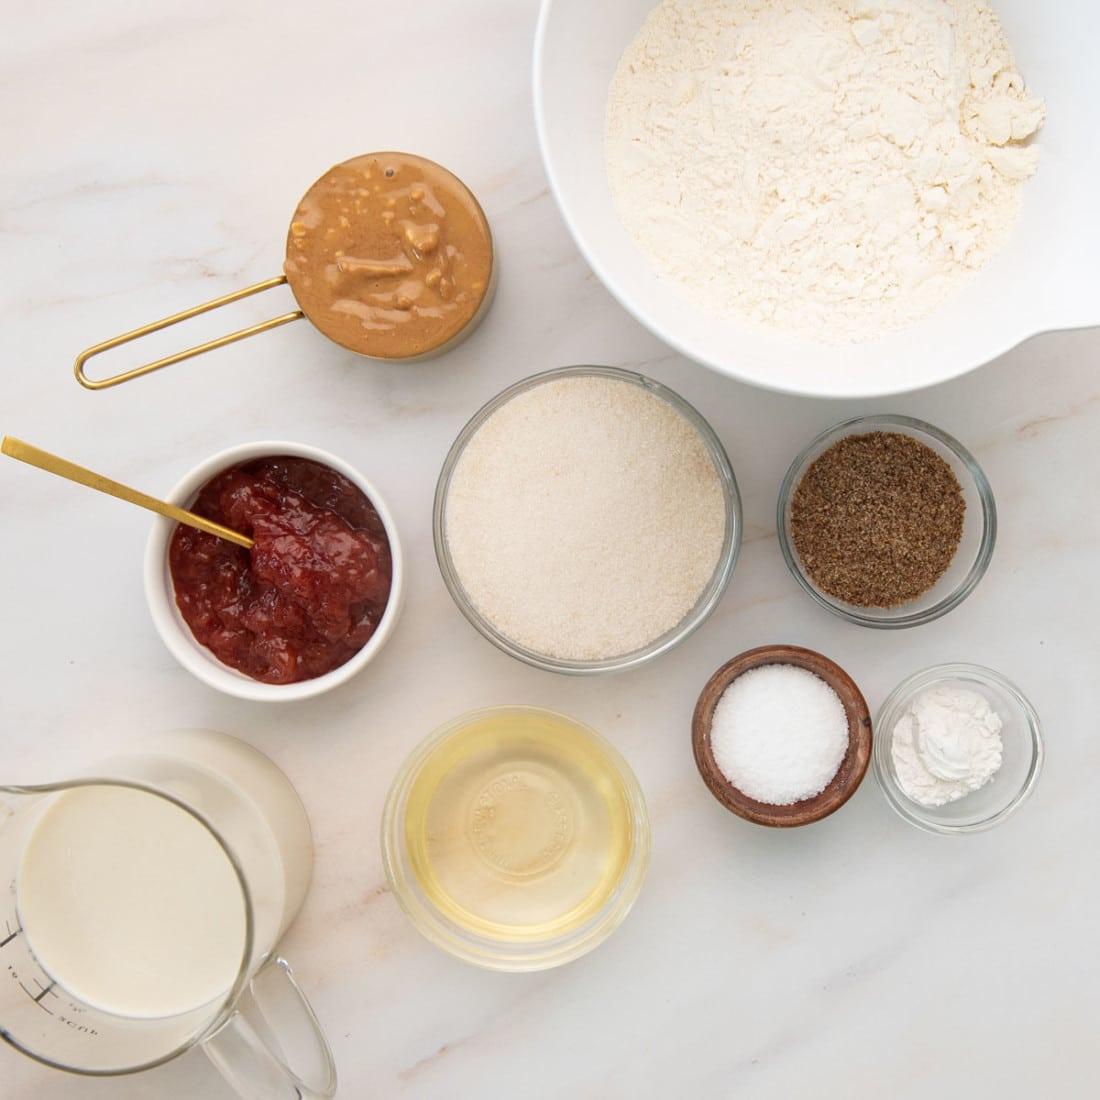 overhead view of ingredients: jam, pb, flax, flour, sugar, baking powder, oat milk